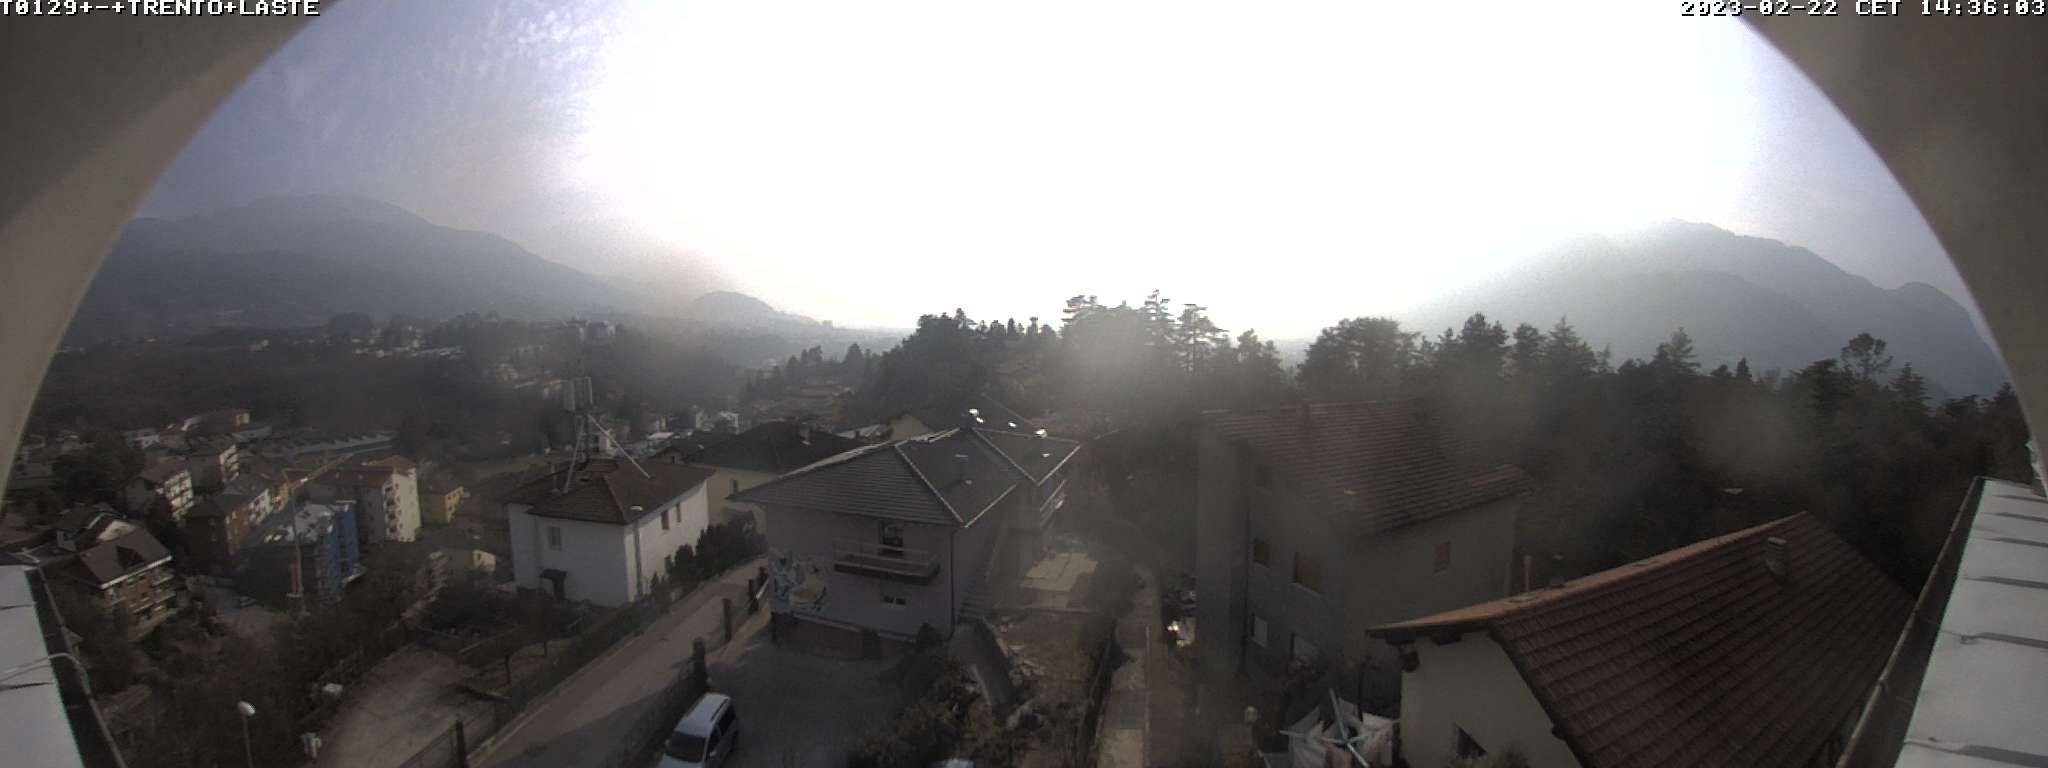 Trento Laste